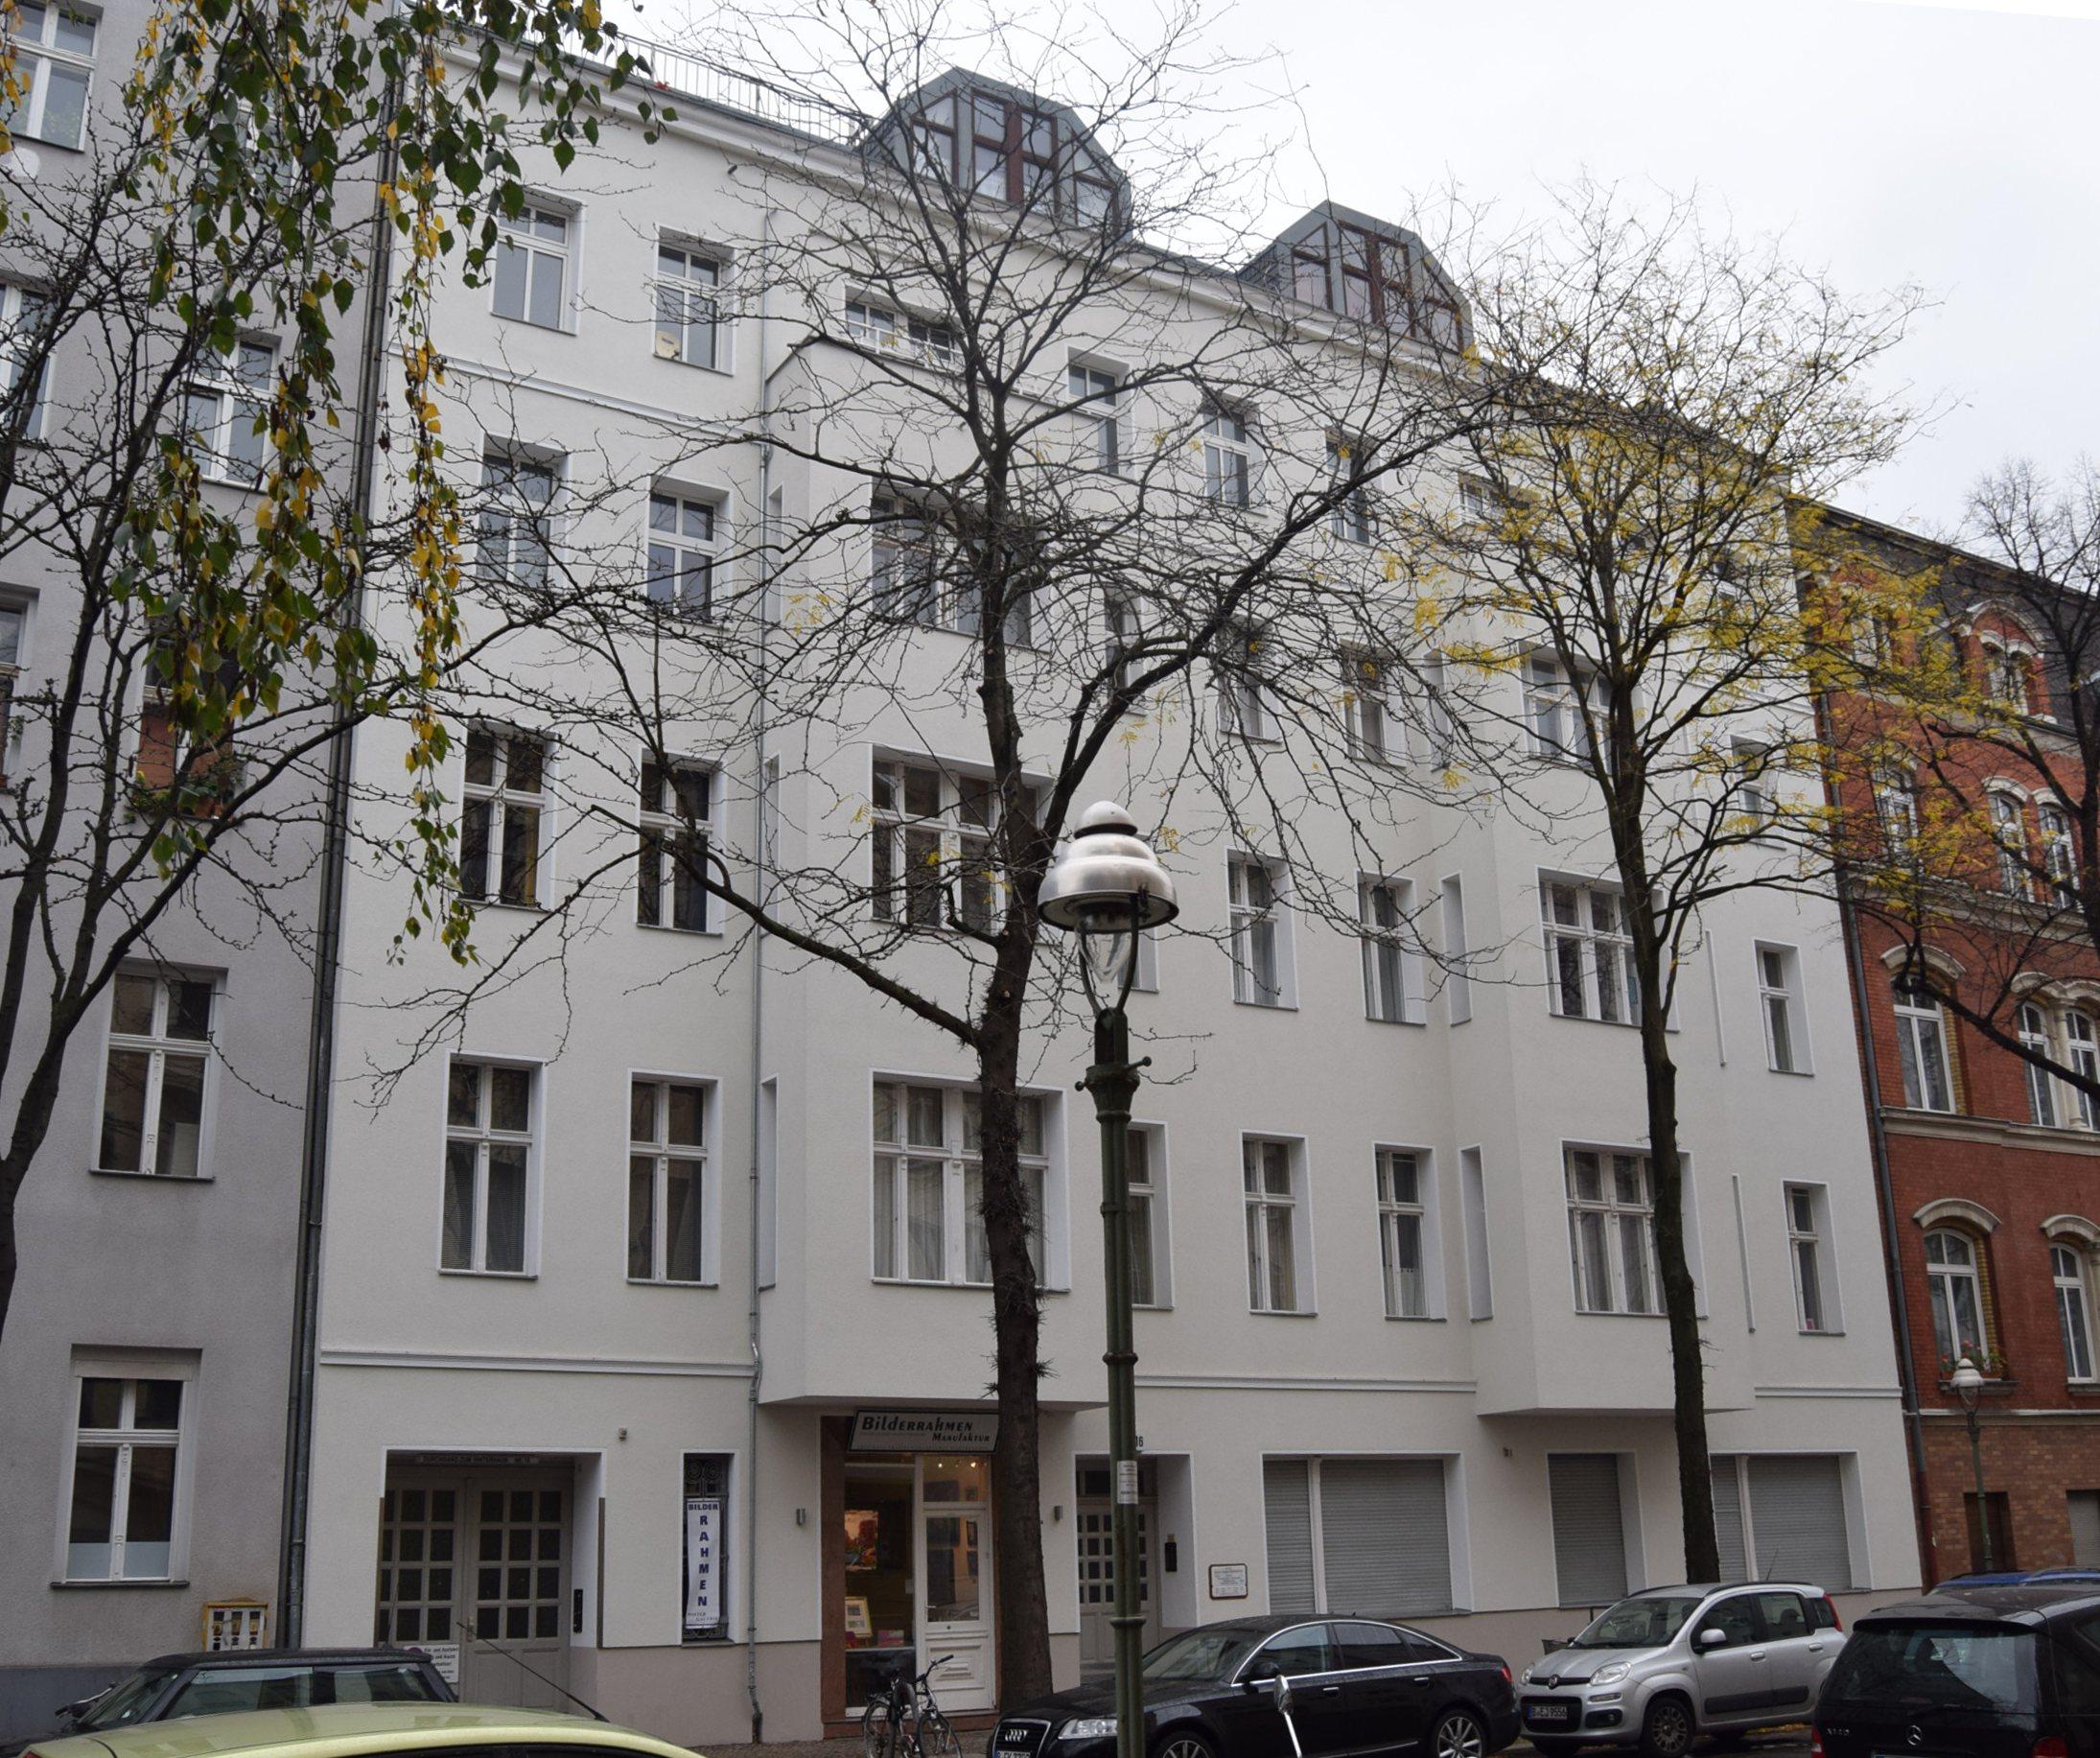 Immobilienverrentung Berlin Charlottenburg Pestallozistraße